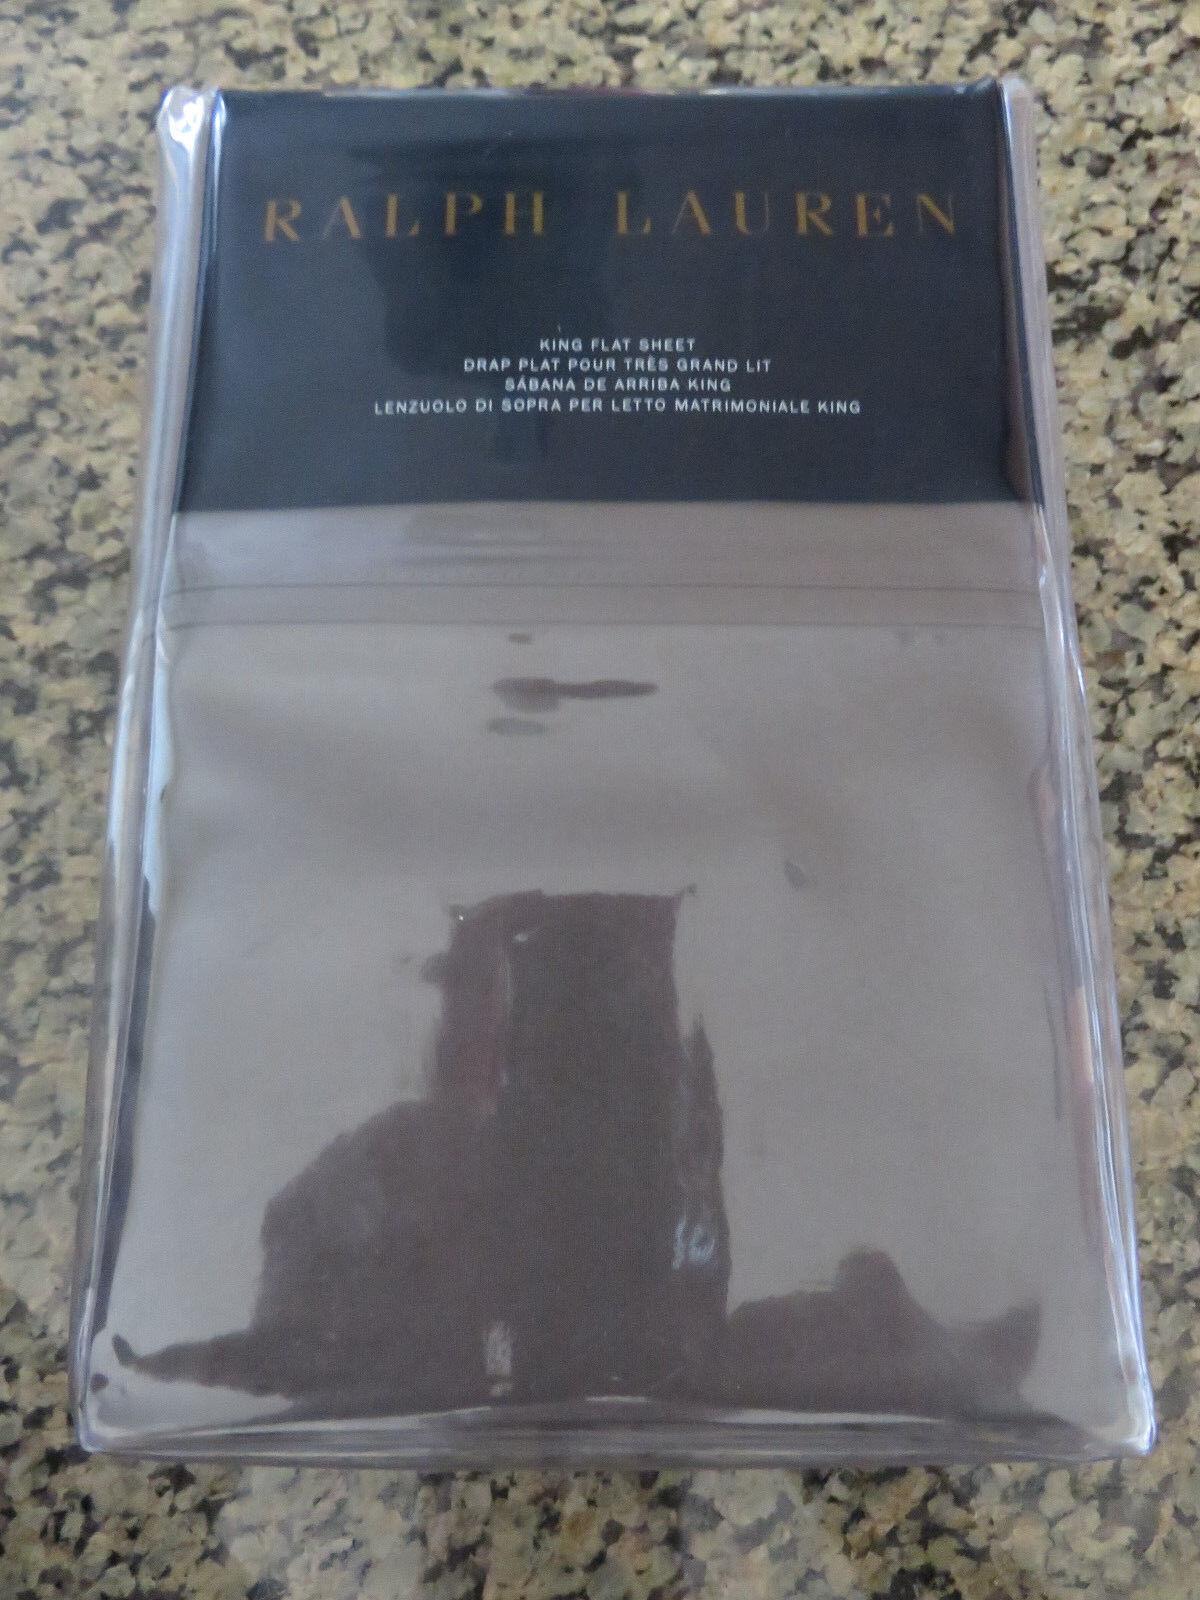 RALPH LAUREN Home Flat Sheet in King, Full and Twin Größes in Modern Charcoal